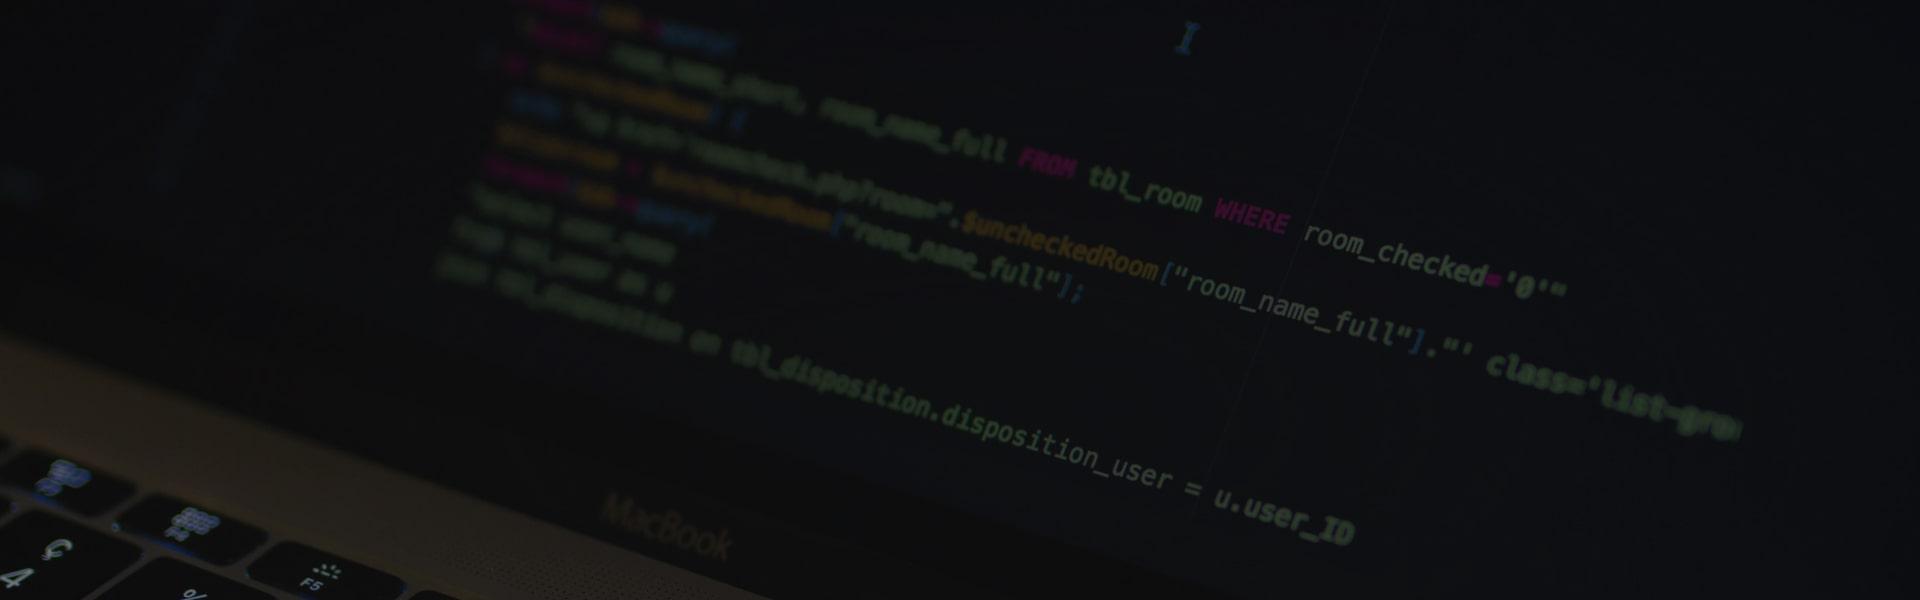 Hire Dedicated MySQL Developers